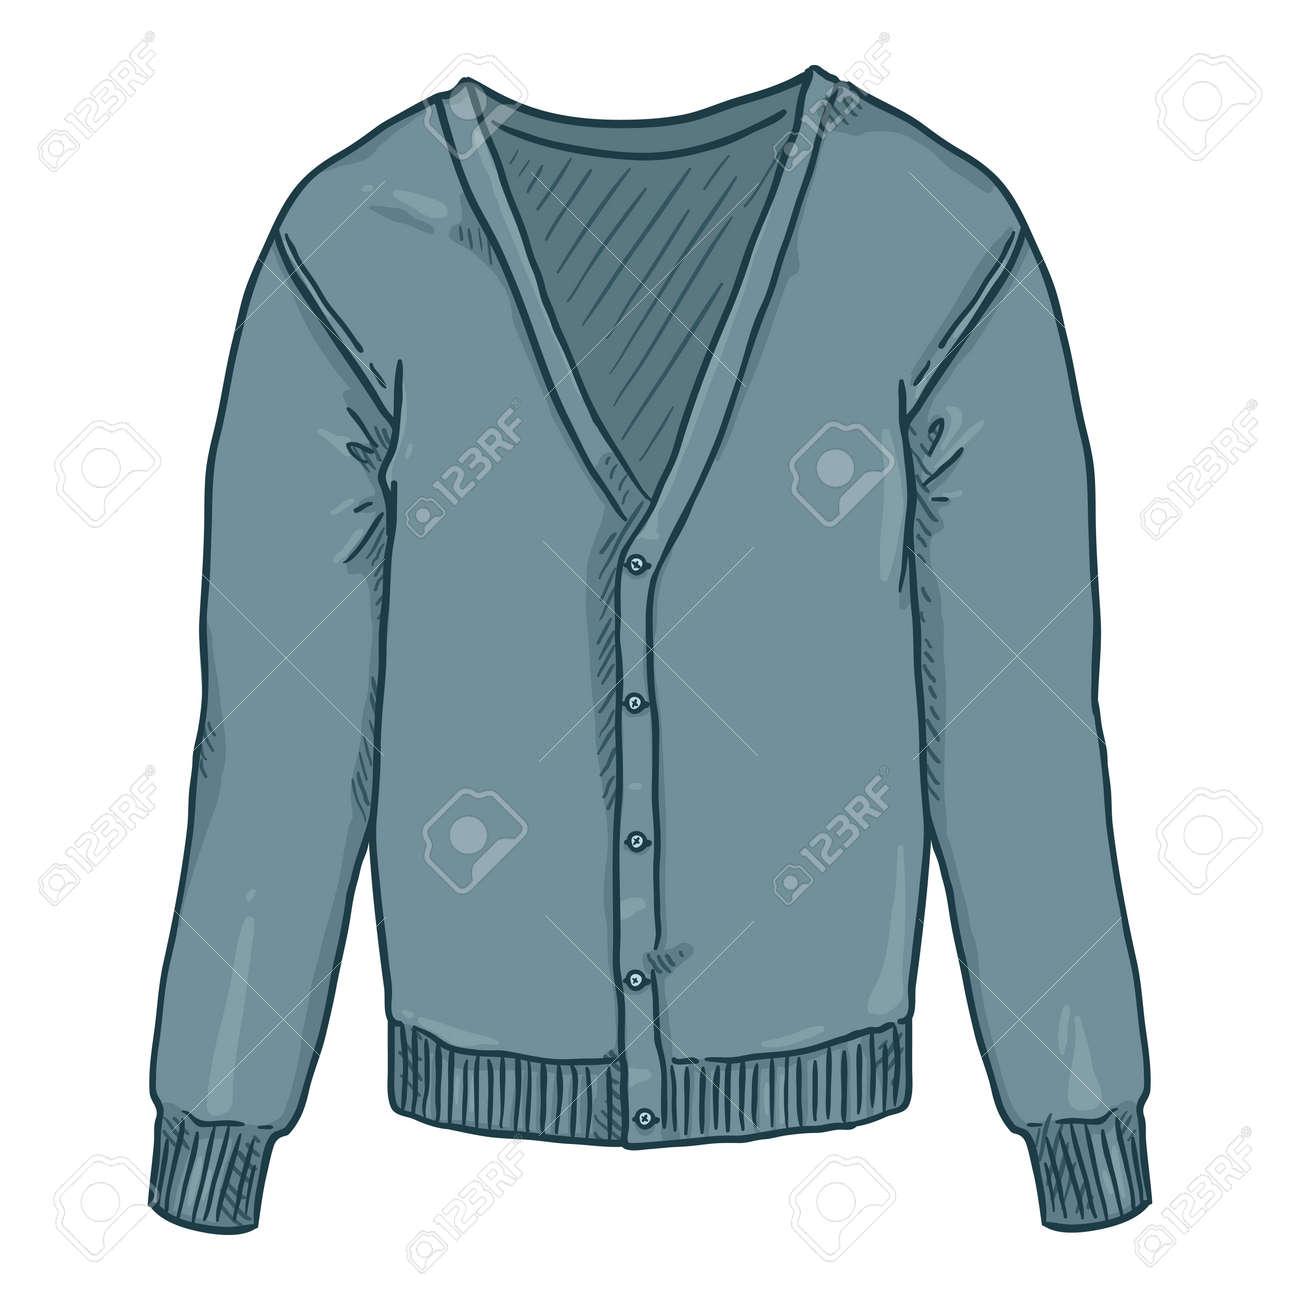 Blue Cardigan on White Background. Vector Cartoon Illustration - 169663663